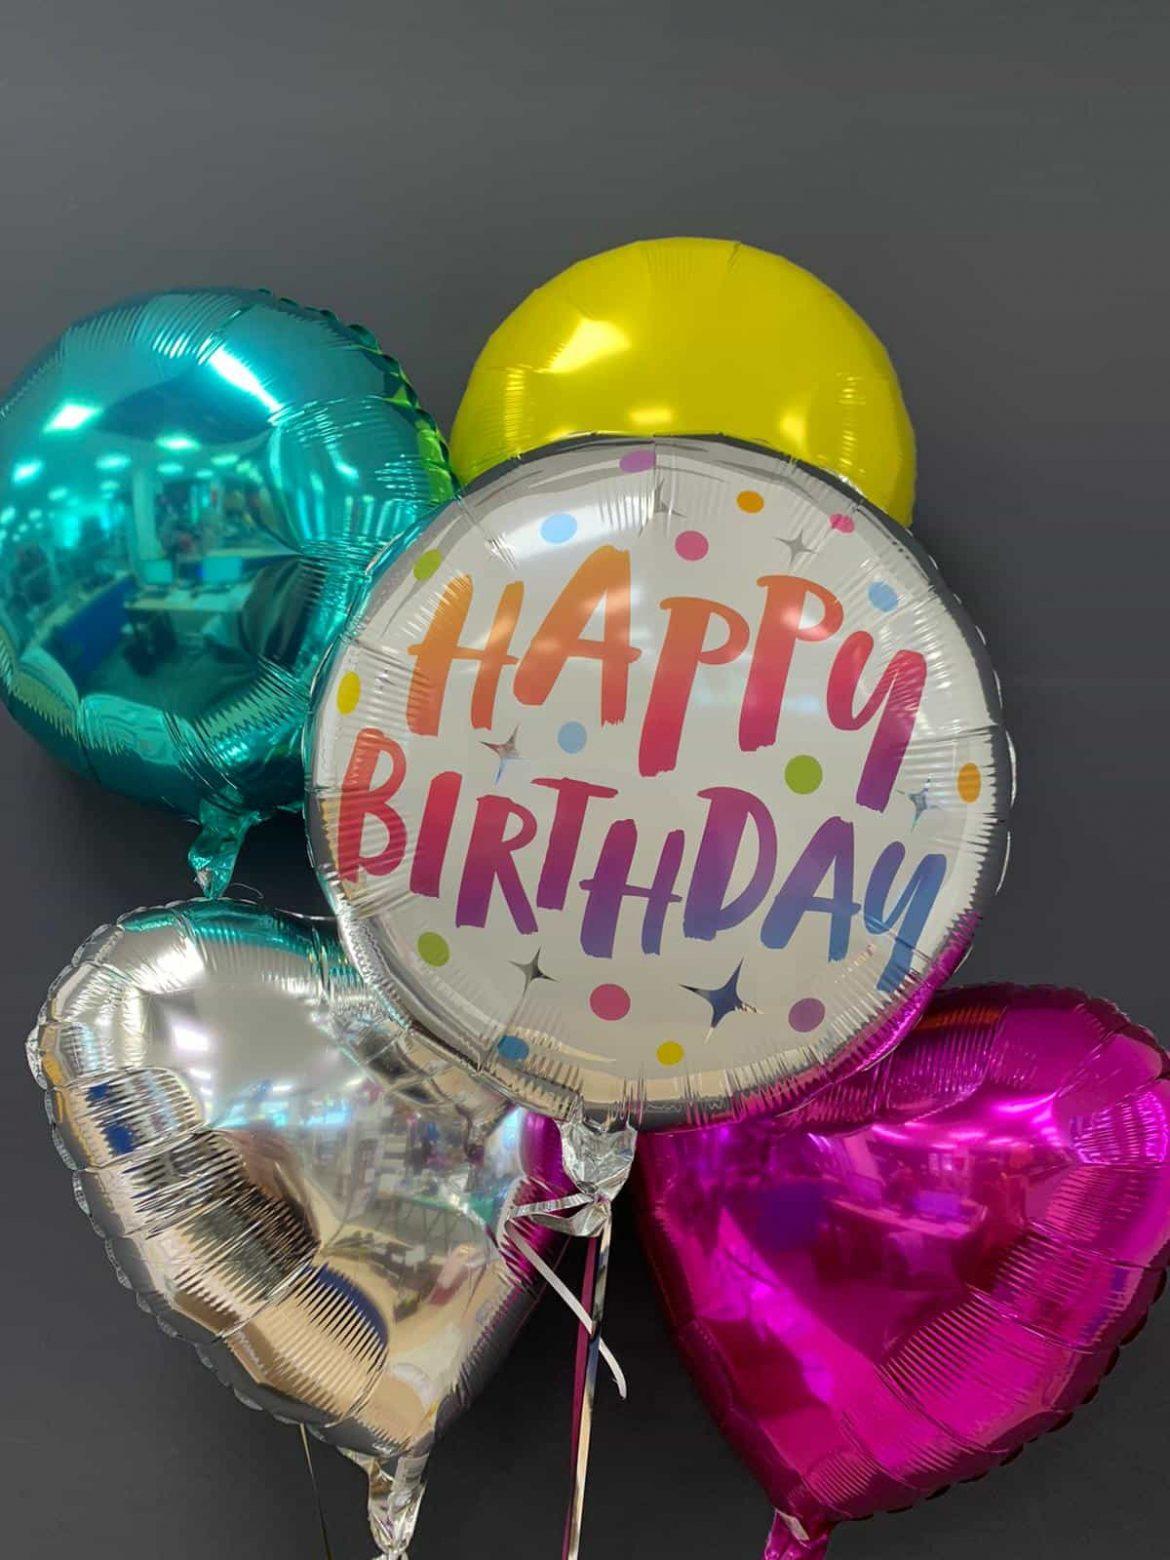 Happy Birthday € 5,50 <br />Dekoballons € 4,50 1